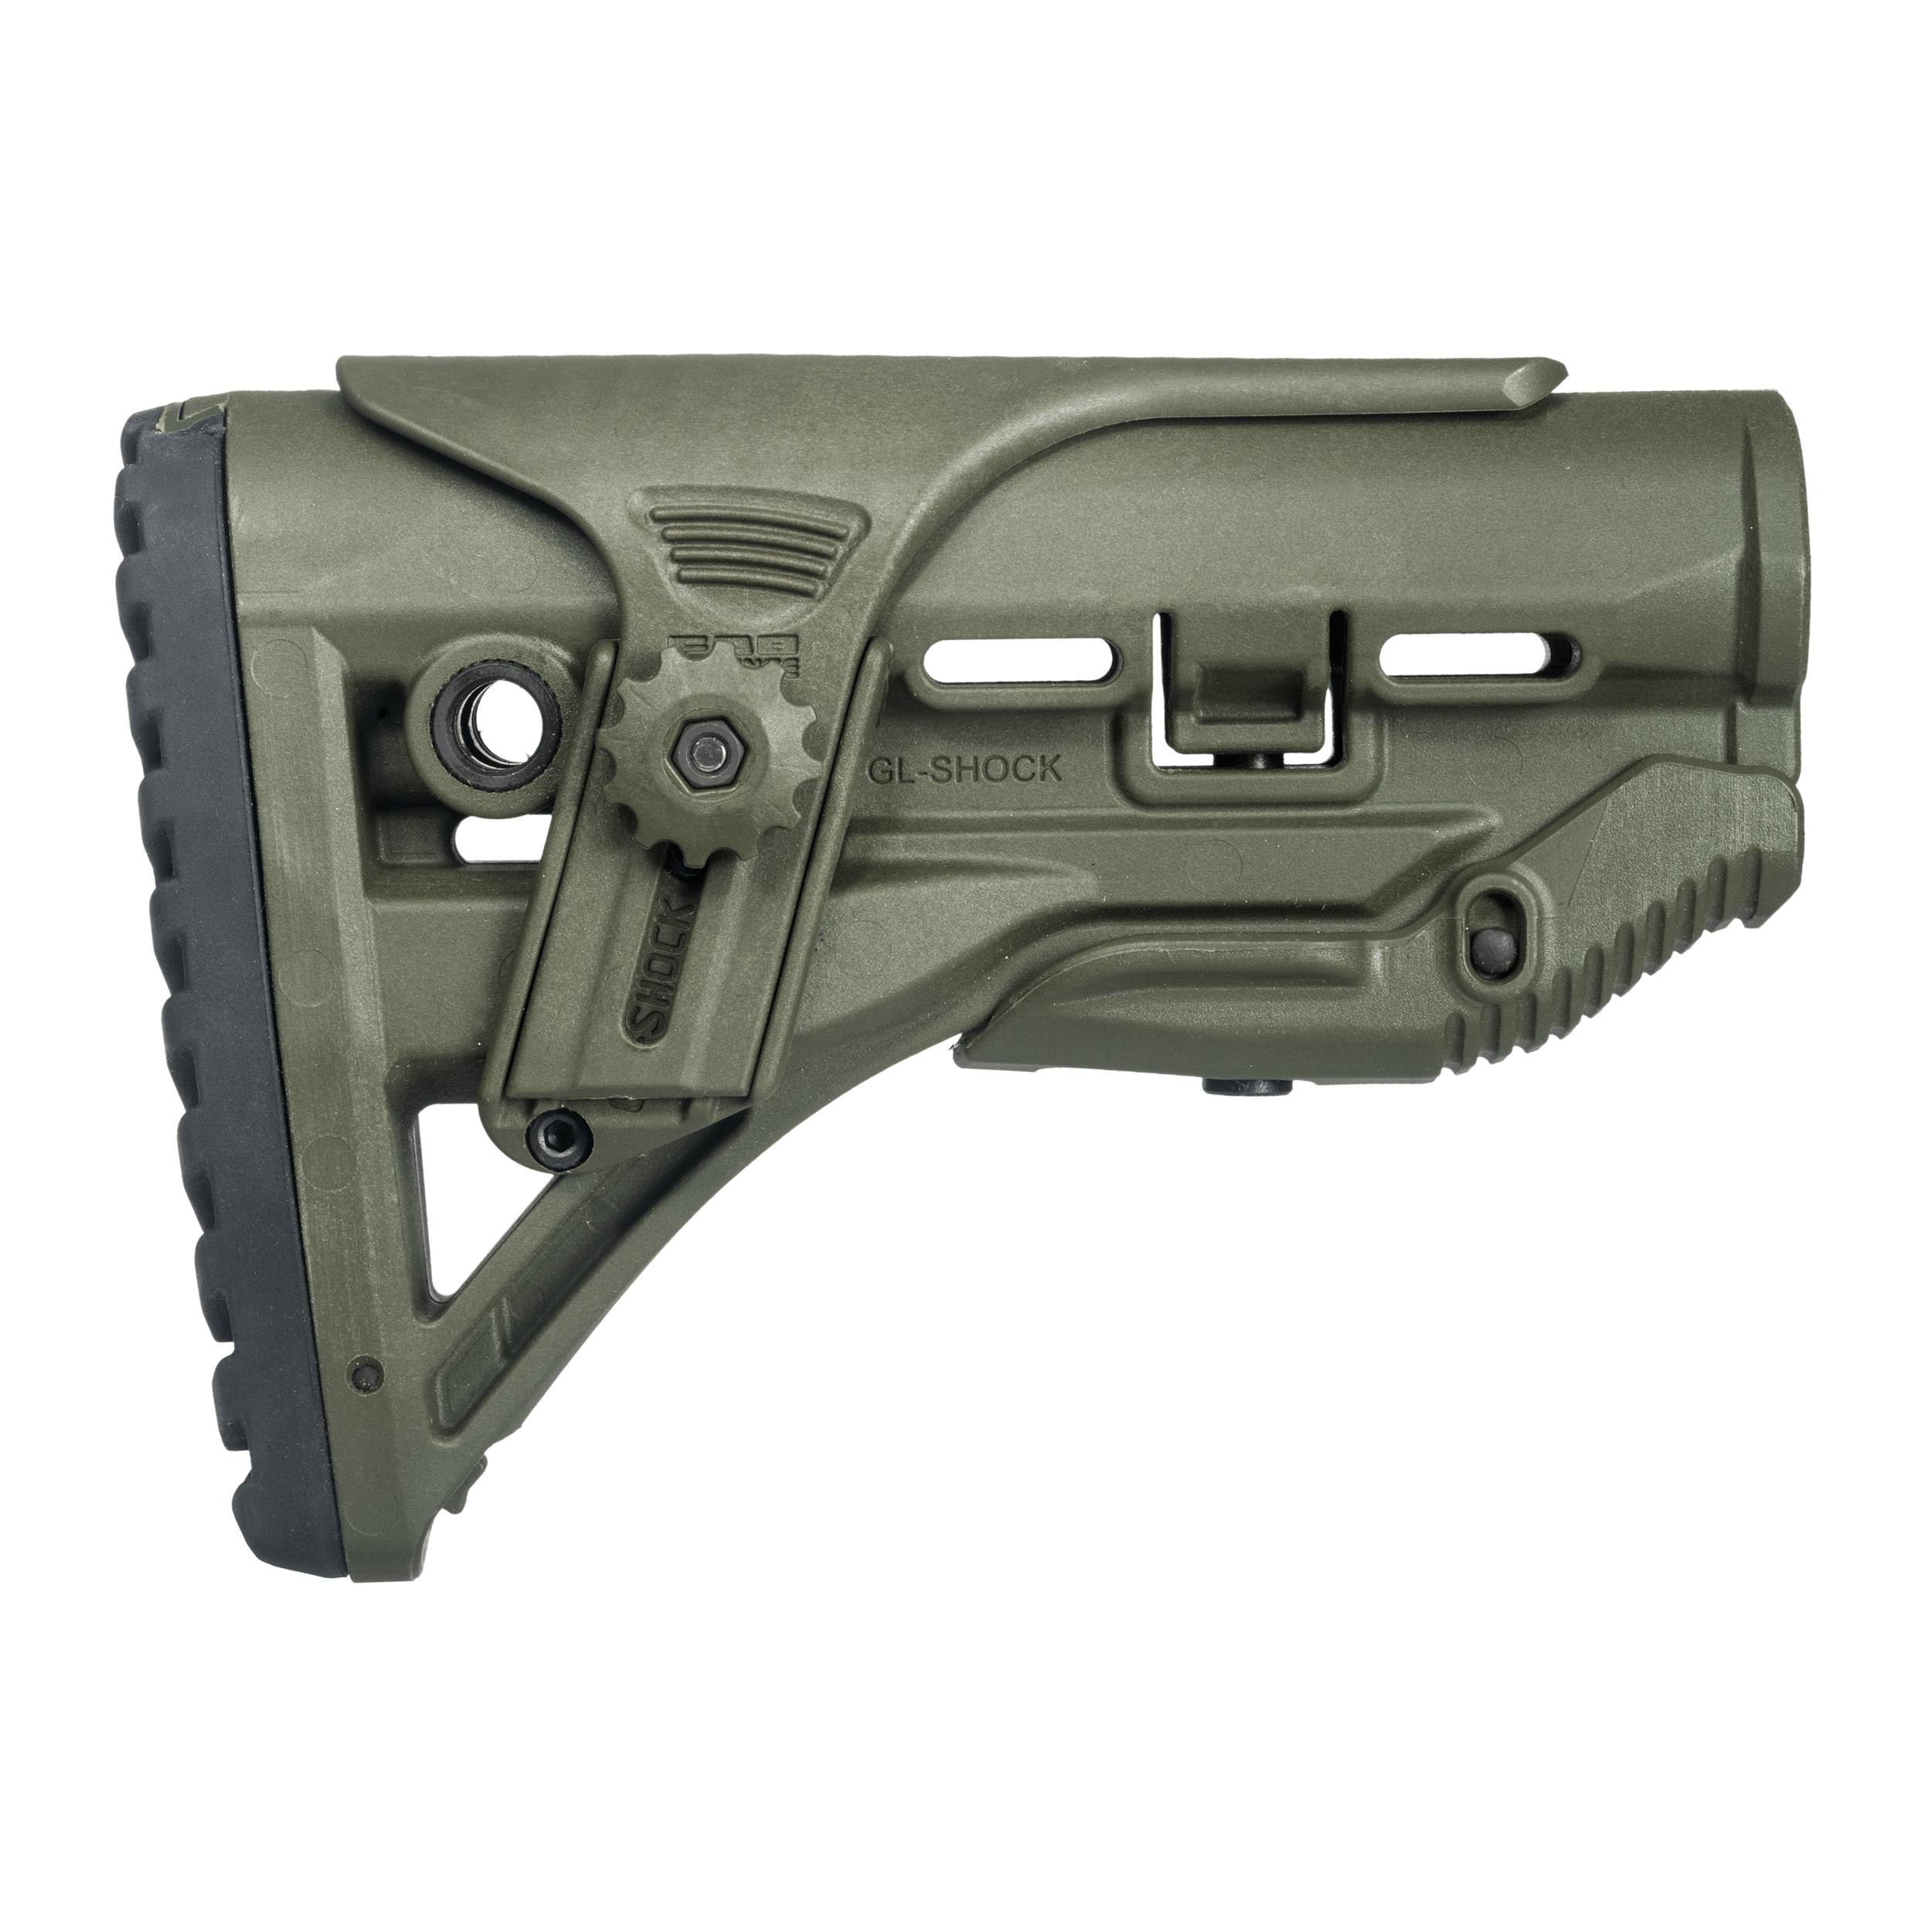 M4/AR15 Shock-Absorbing Buttstock W/ Cheek Rest